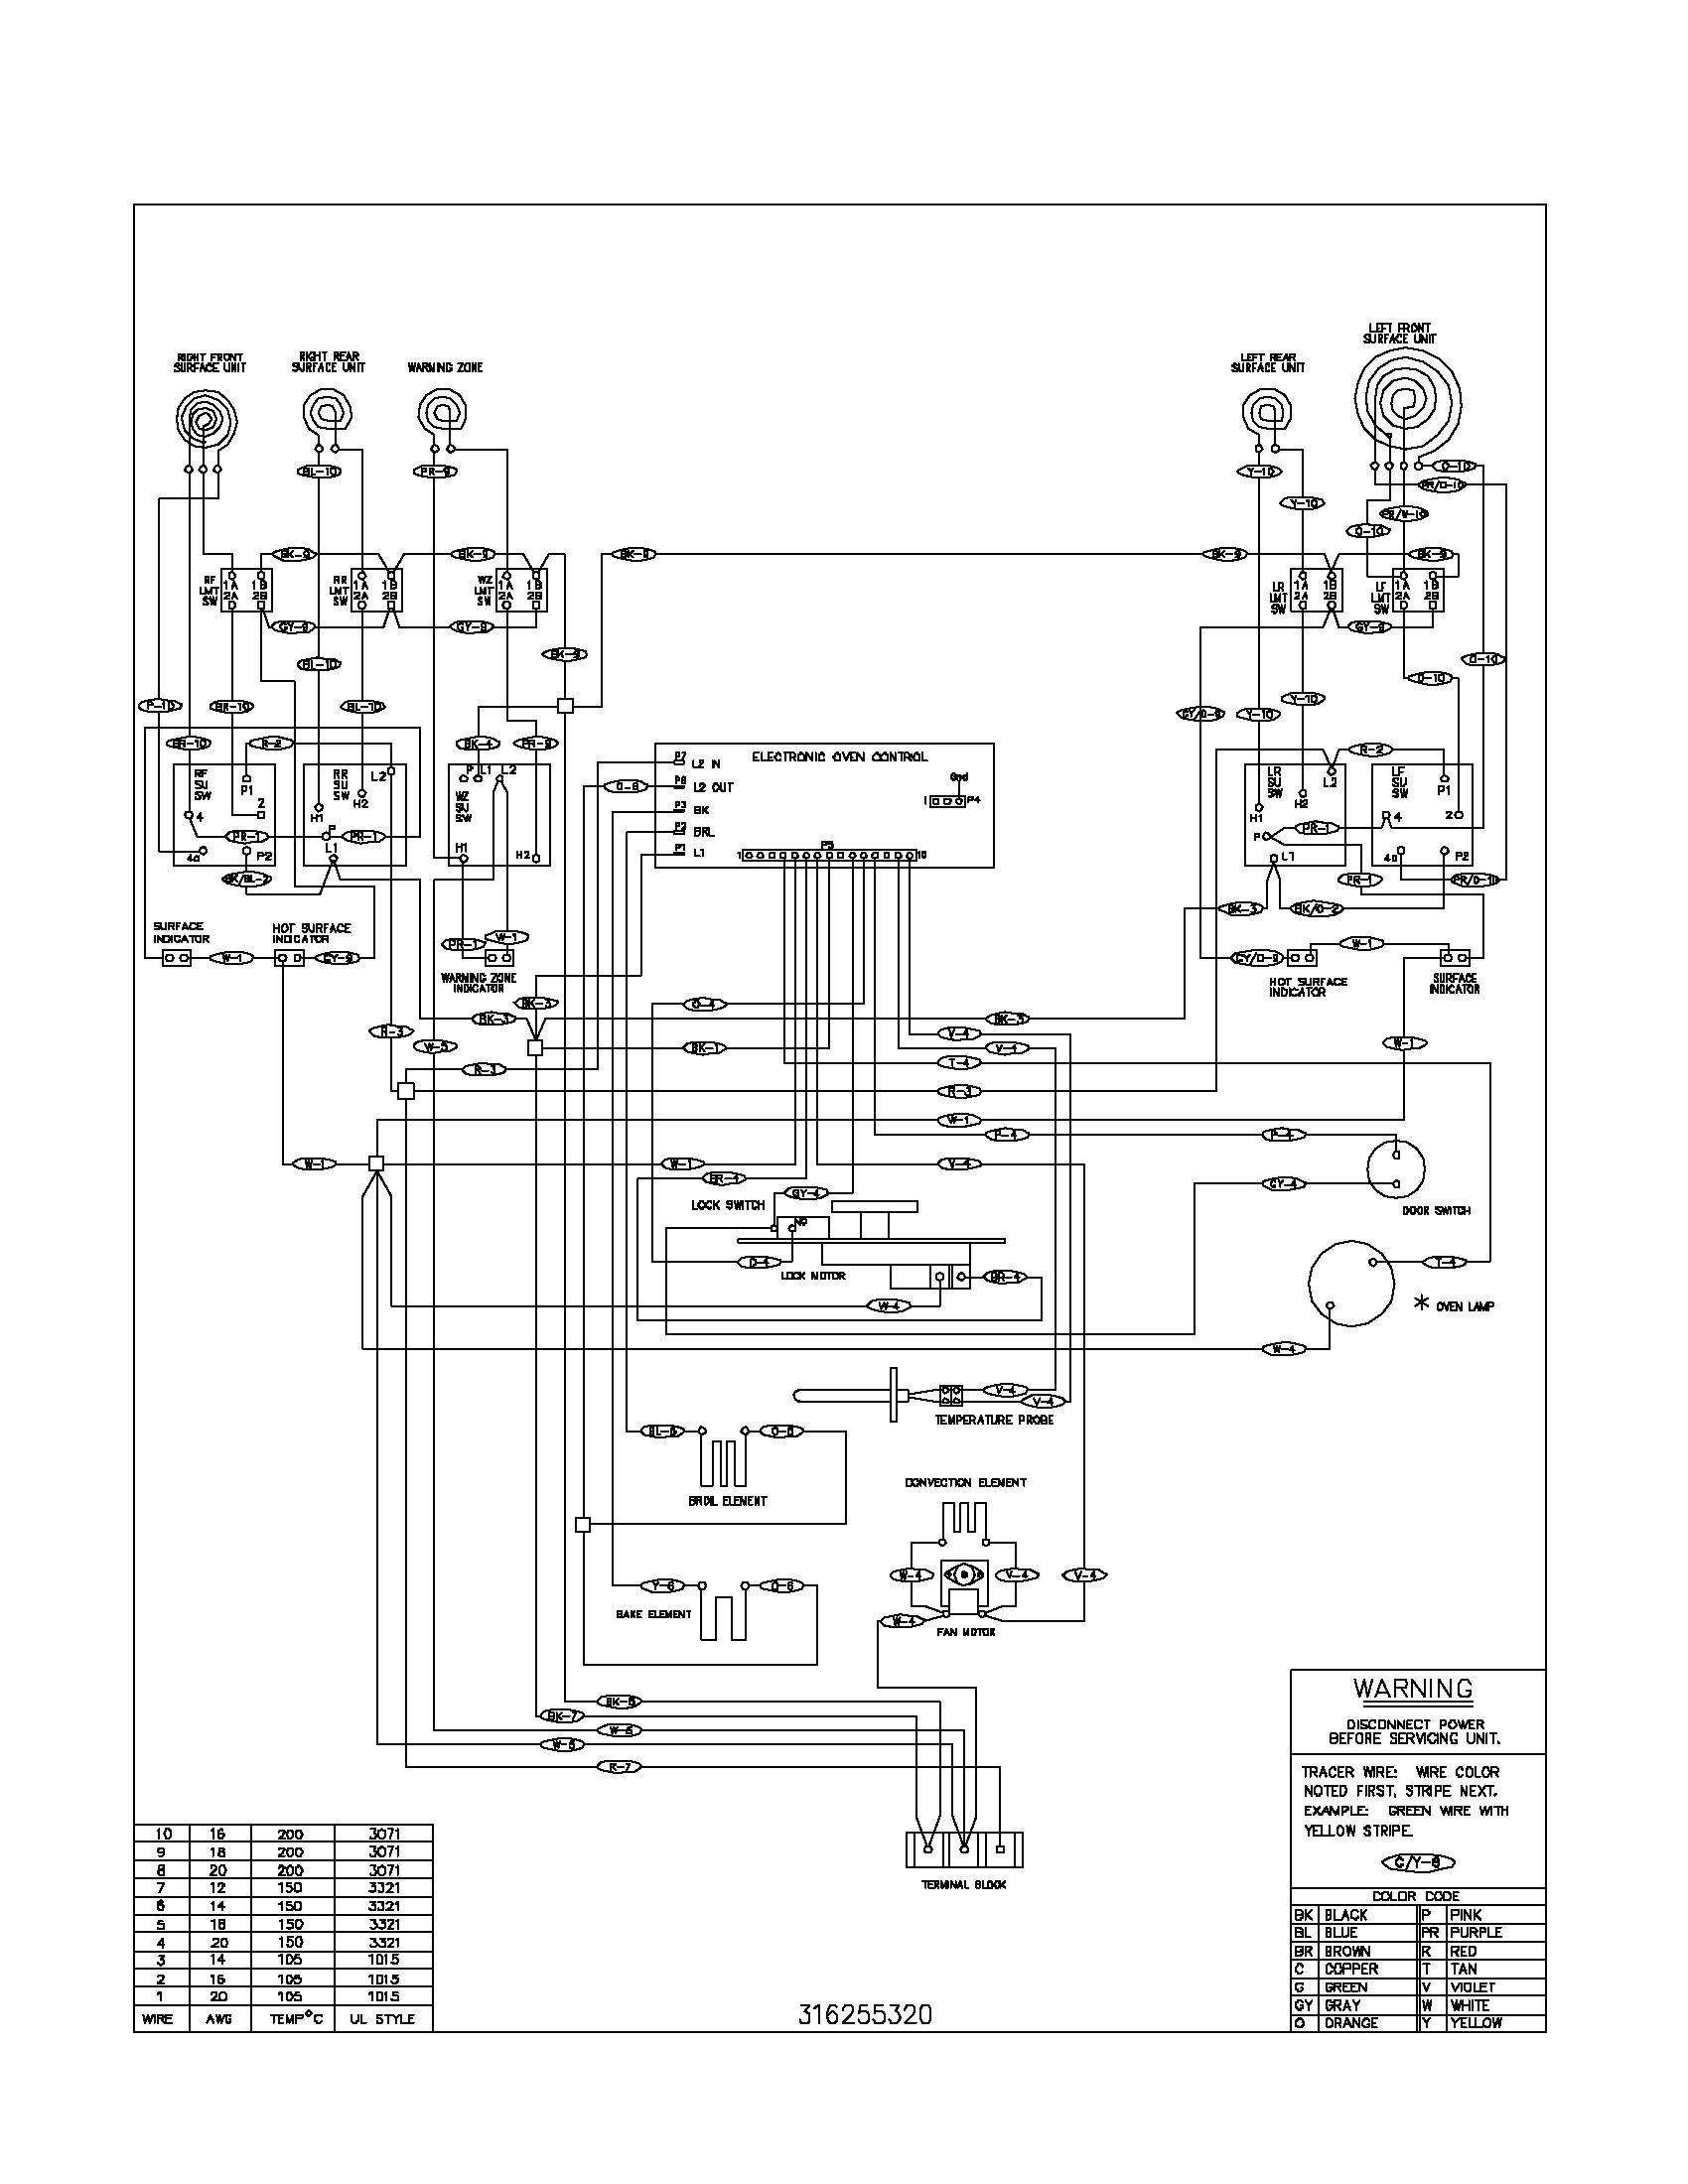 Ge Oven Wiring Diagram Jbp68hd1cc - Shore Power Wiring Diagram -  jeep-wrangler.nescafe-cappu.jeanjaures37.fr   Ge Oven Wiring Diagram Jbp68hd1cc      Wiring Diagram Resource